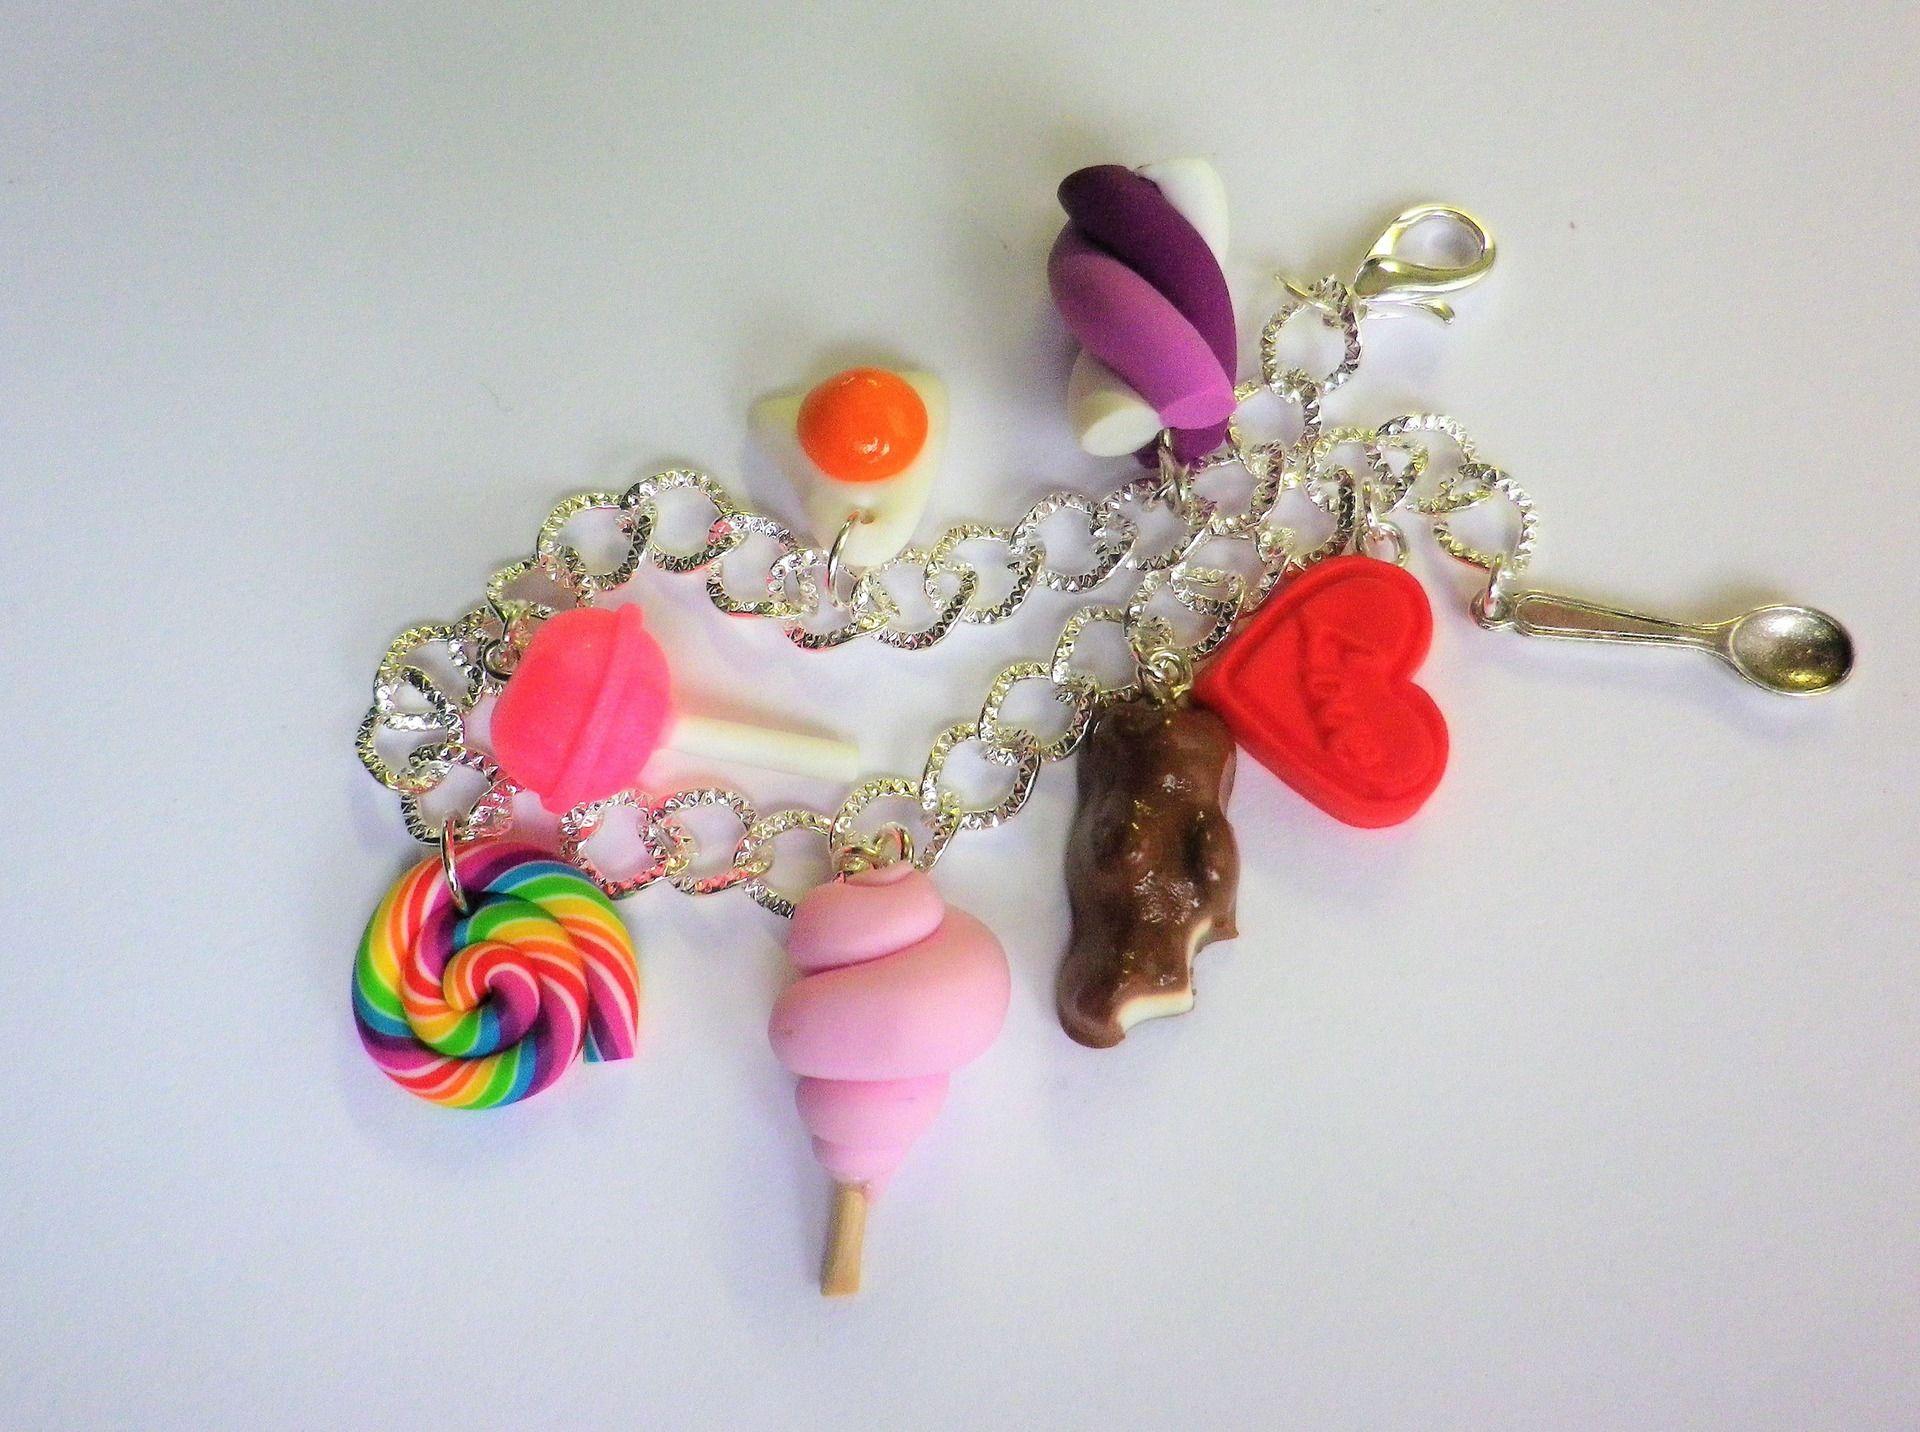 bracelet gourmand bonbons fimo bijou gourmand id e cadeau acheter pinterest bonbon. Black Bedroom Furniture Sets. Home Design Ideas